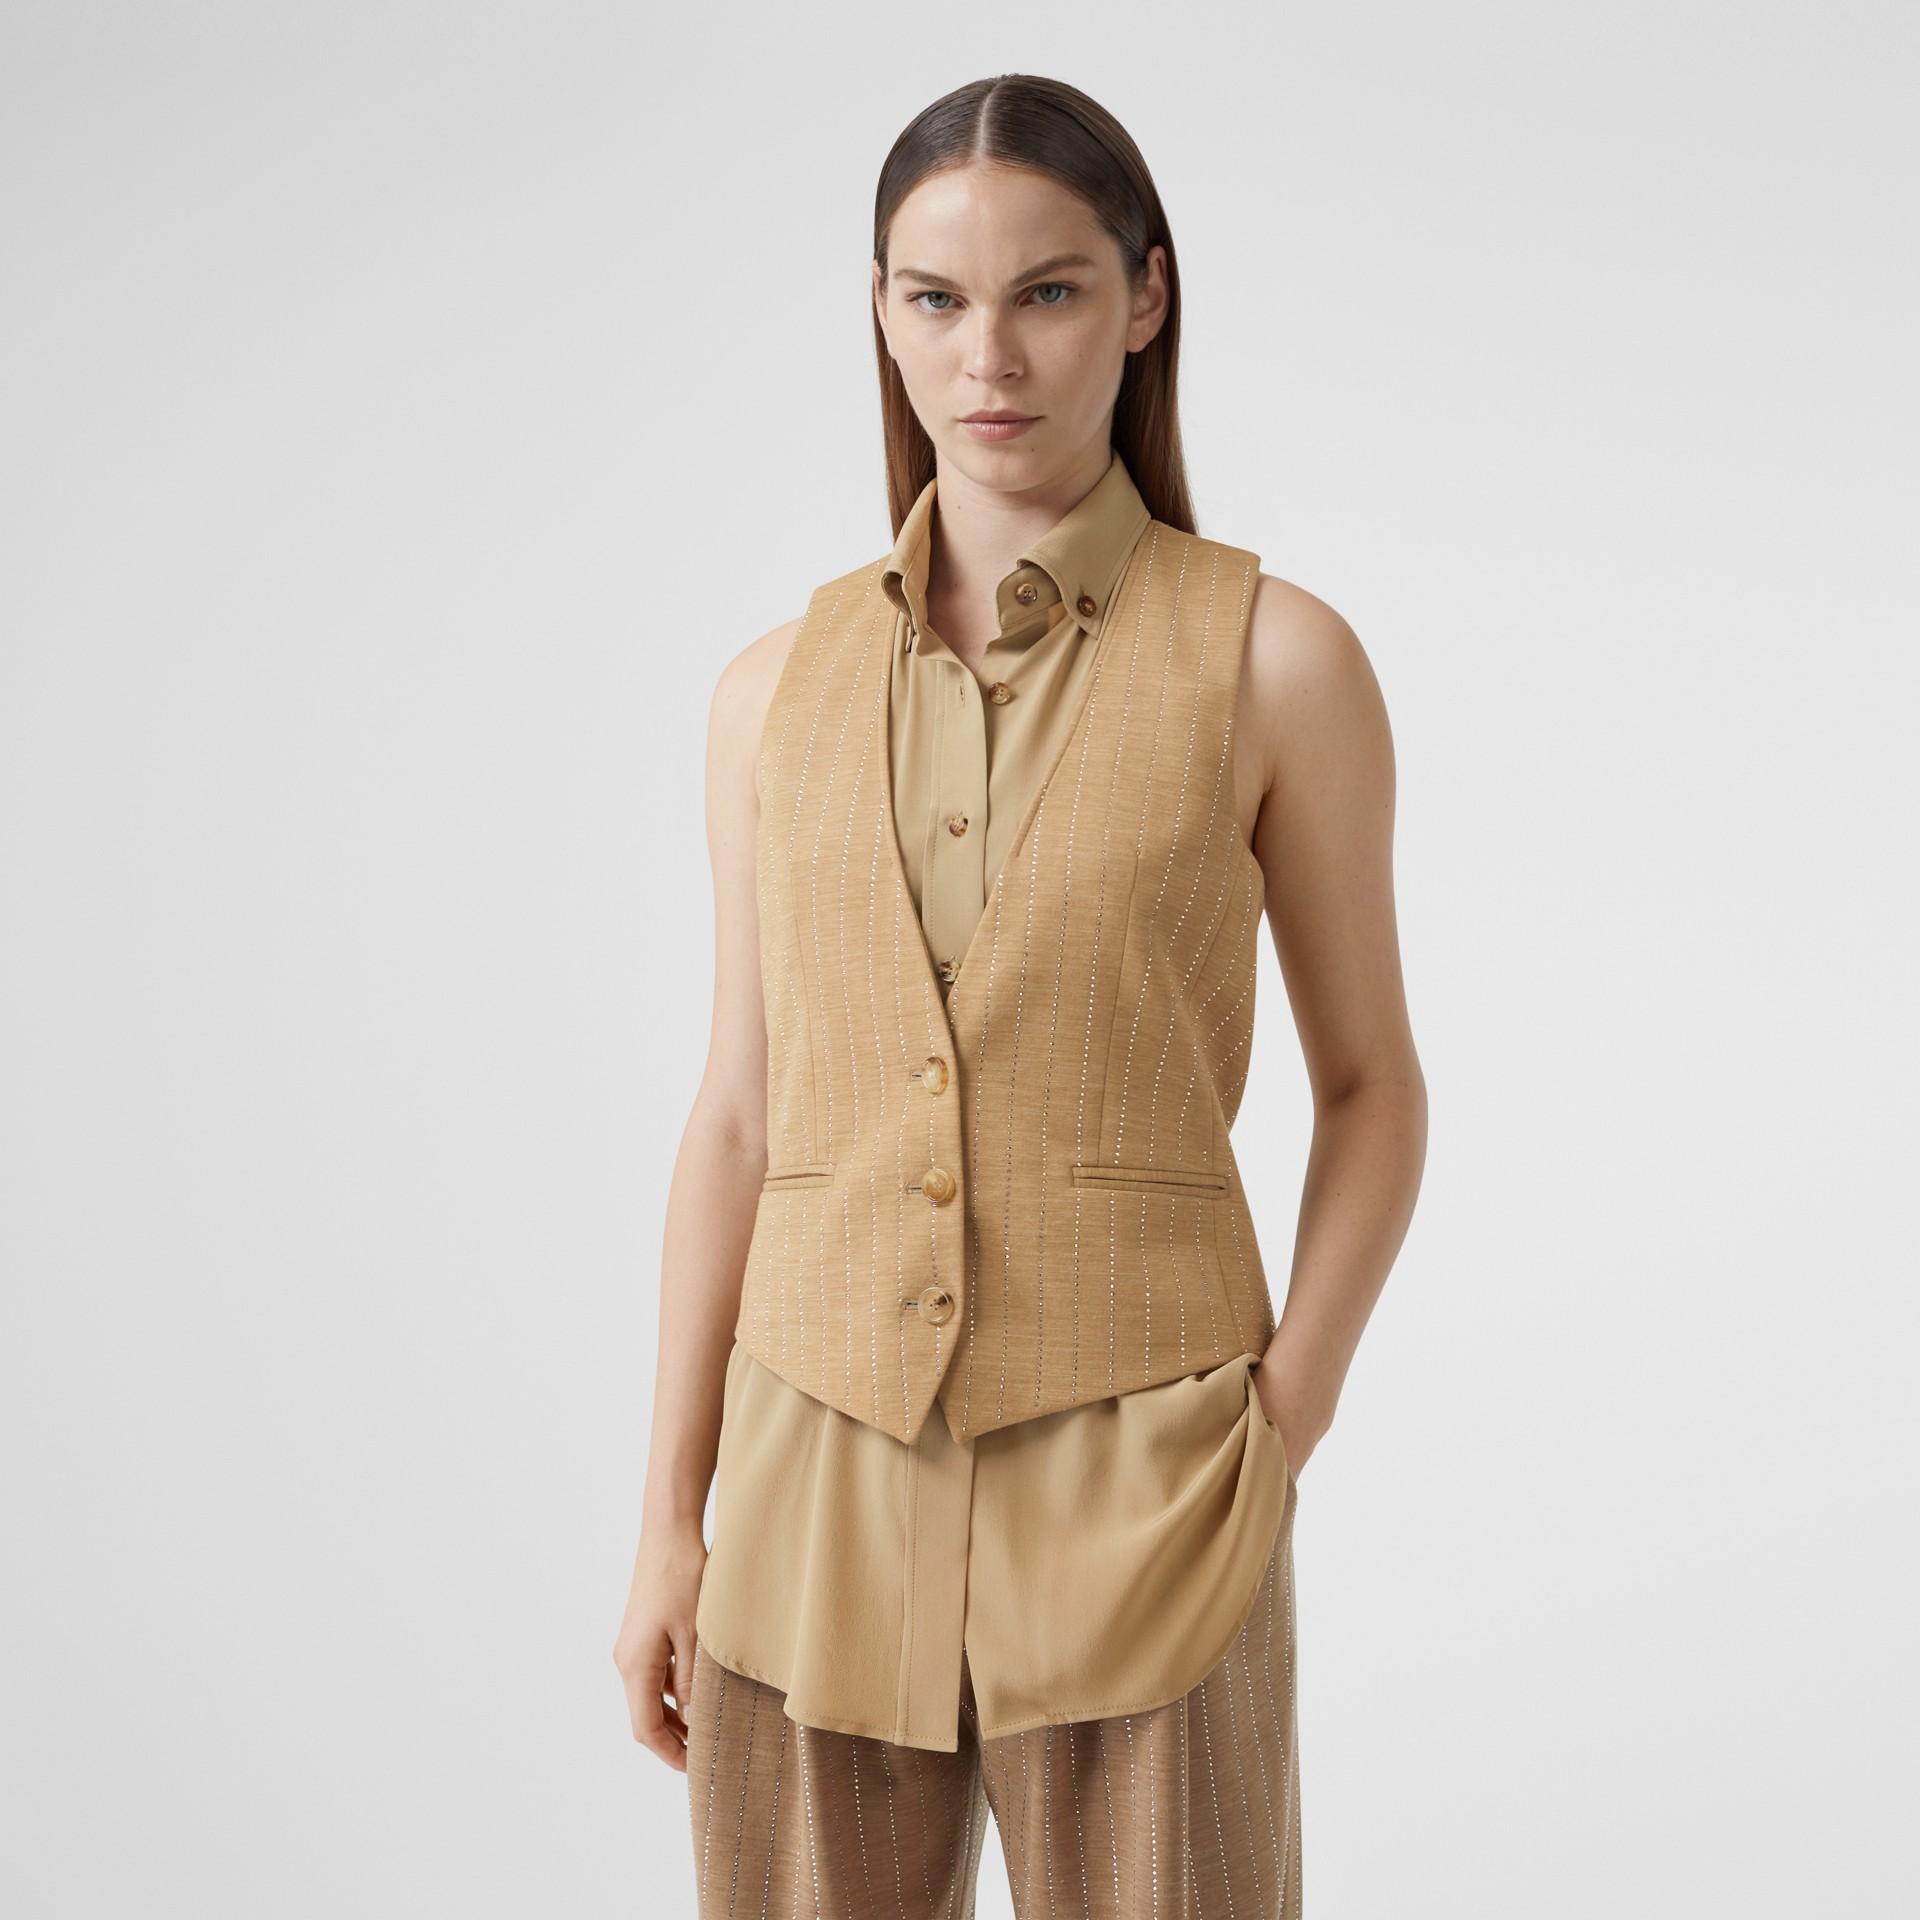 Shirt Detail Crystal Pinstriped Wool Blend Waistcoat in Pecan Melange - Women | Burberry Australia - gallery image 4